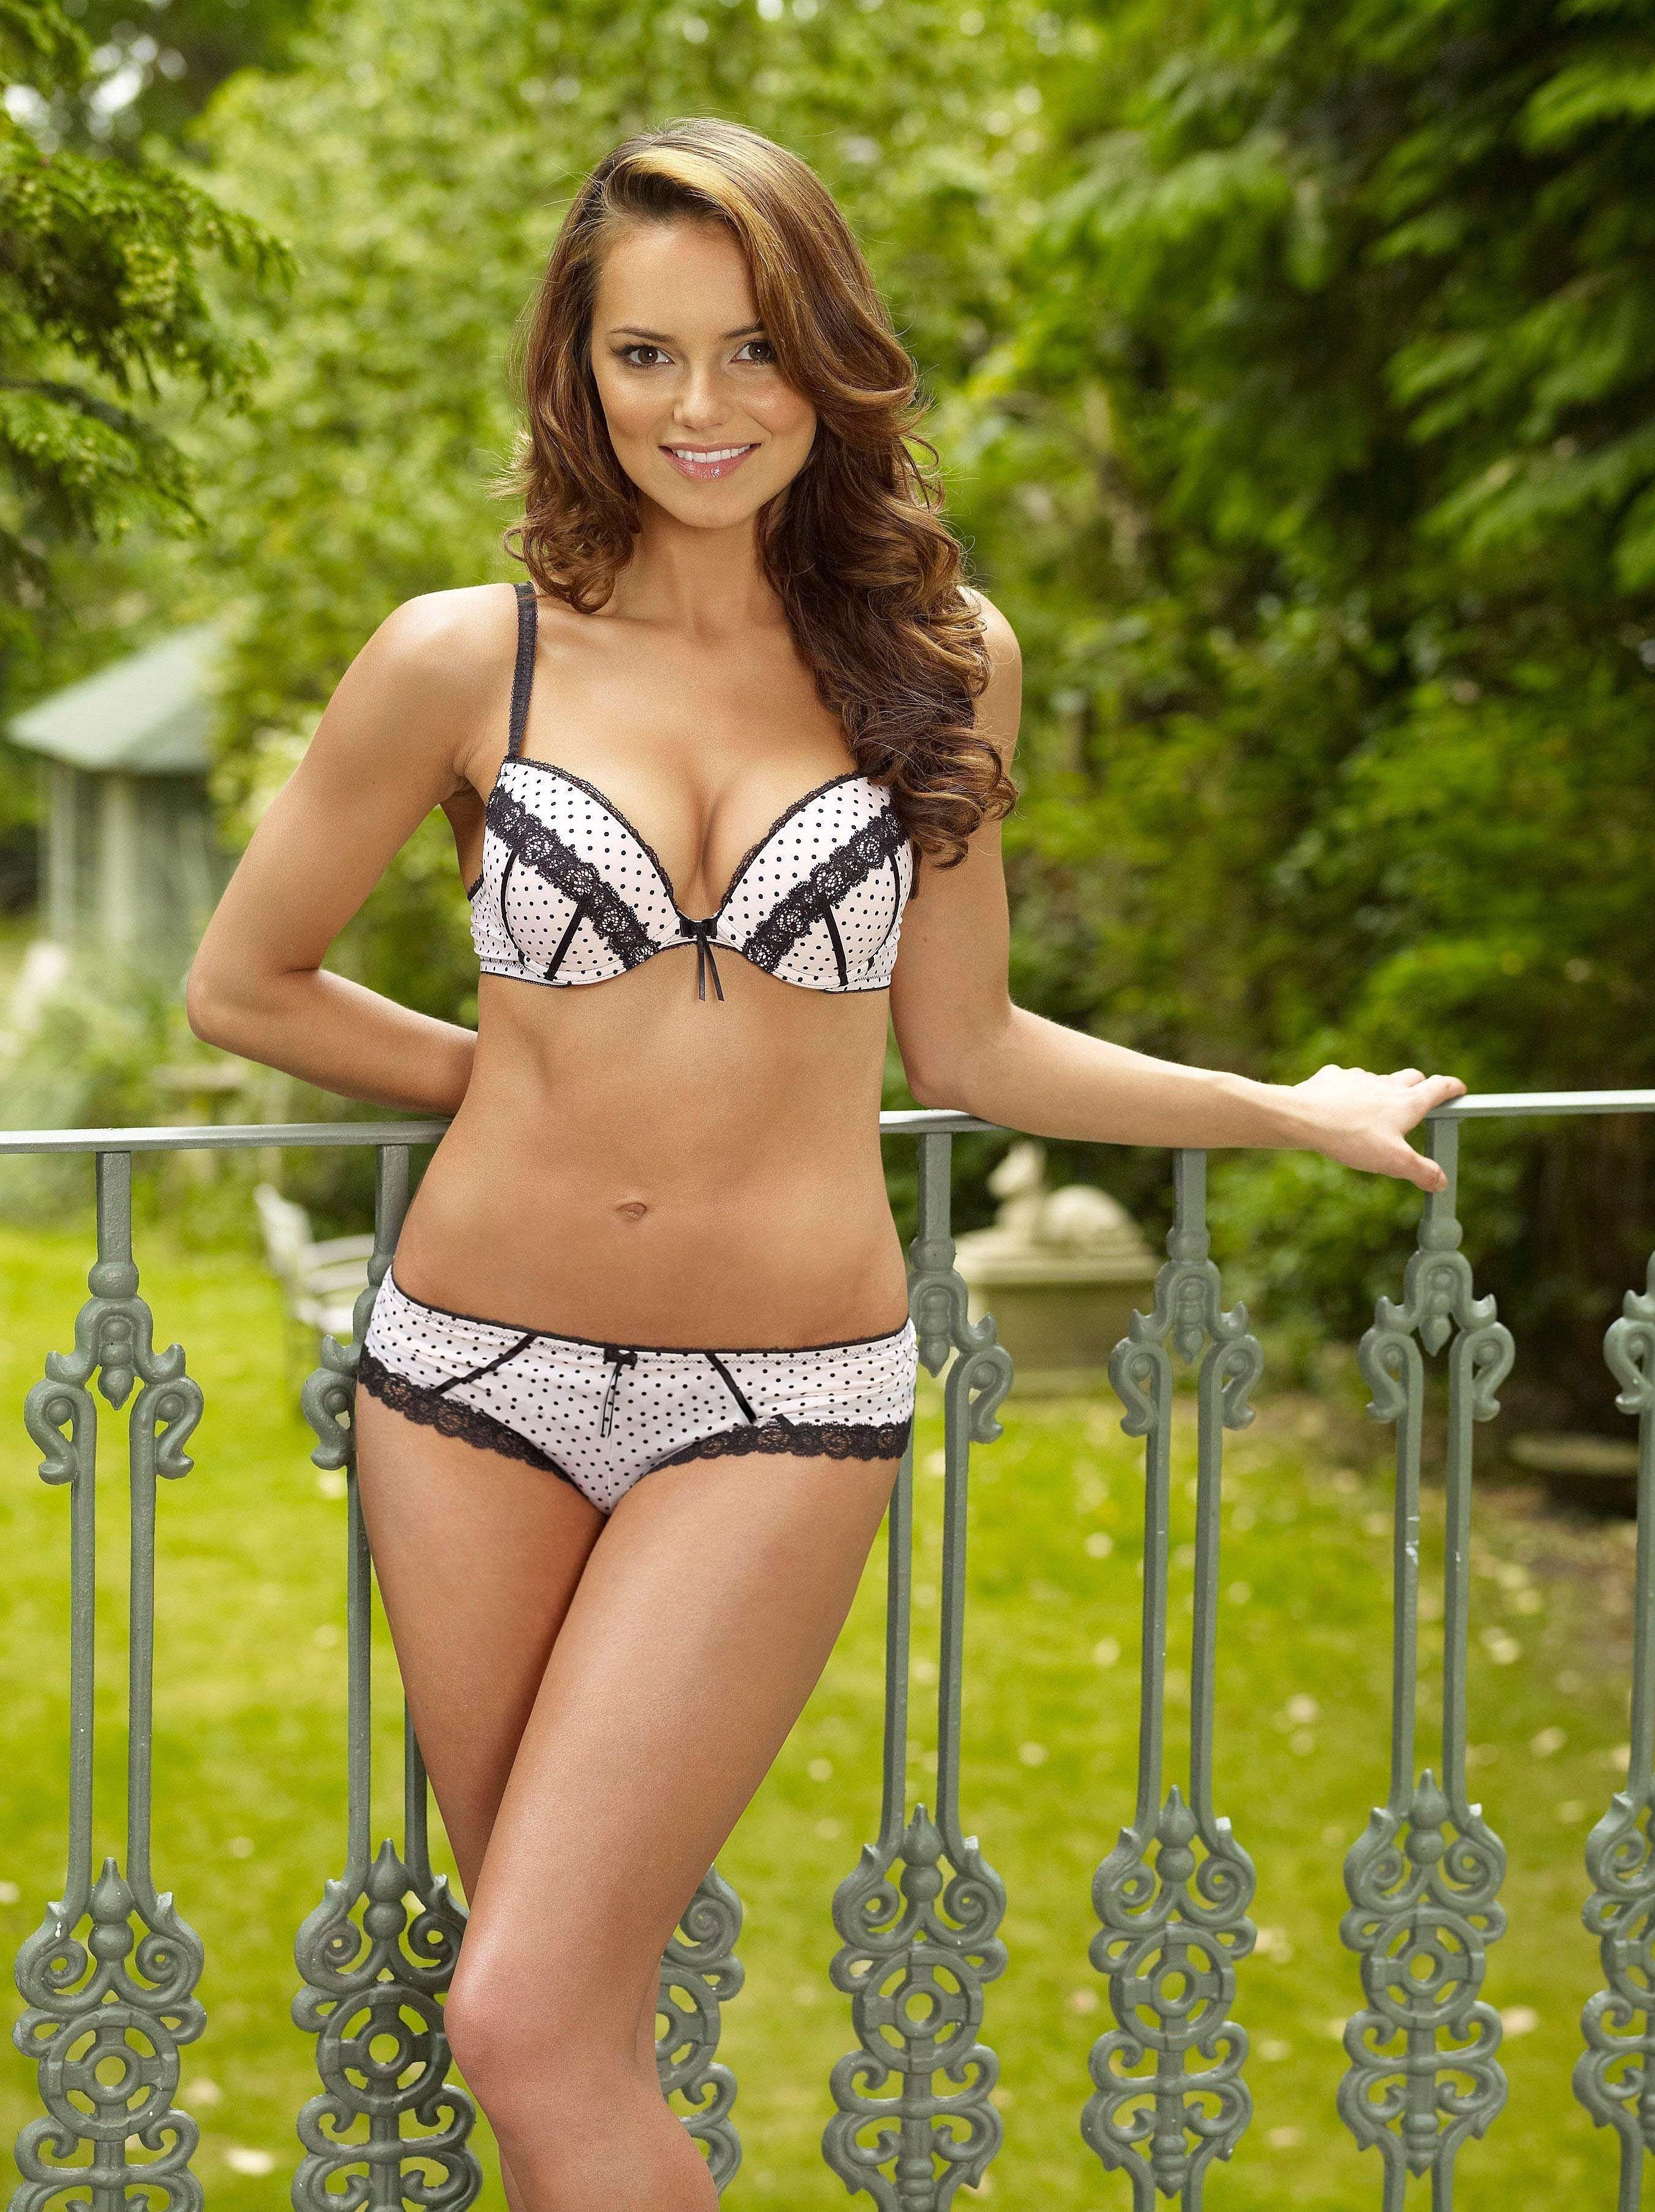 Kara tointon bikini, free girls tight shorts galleries